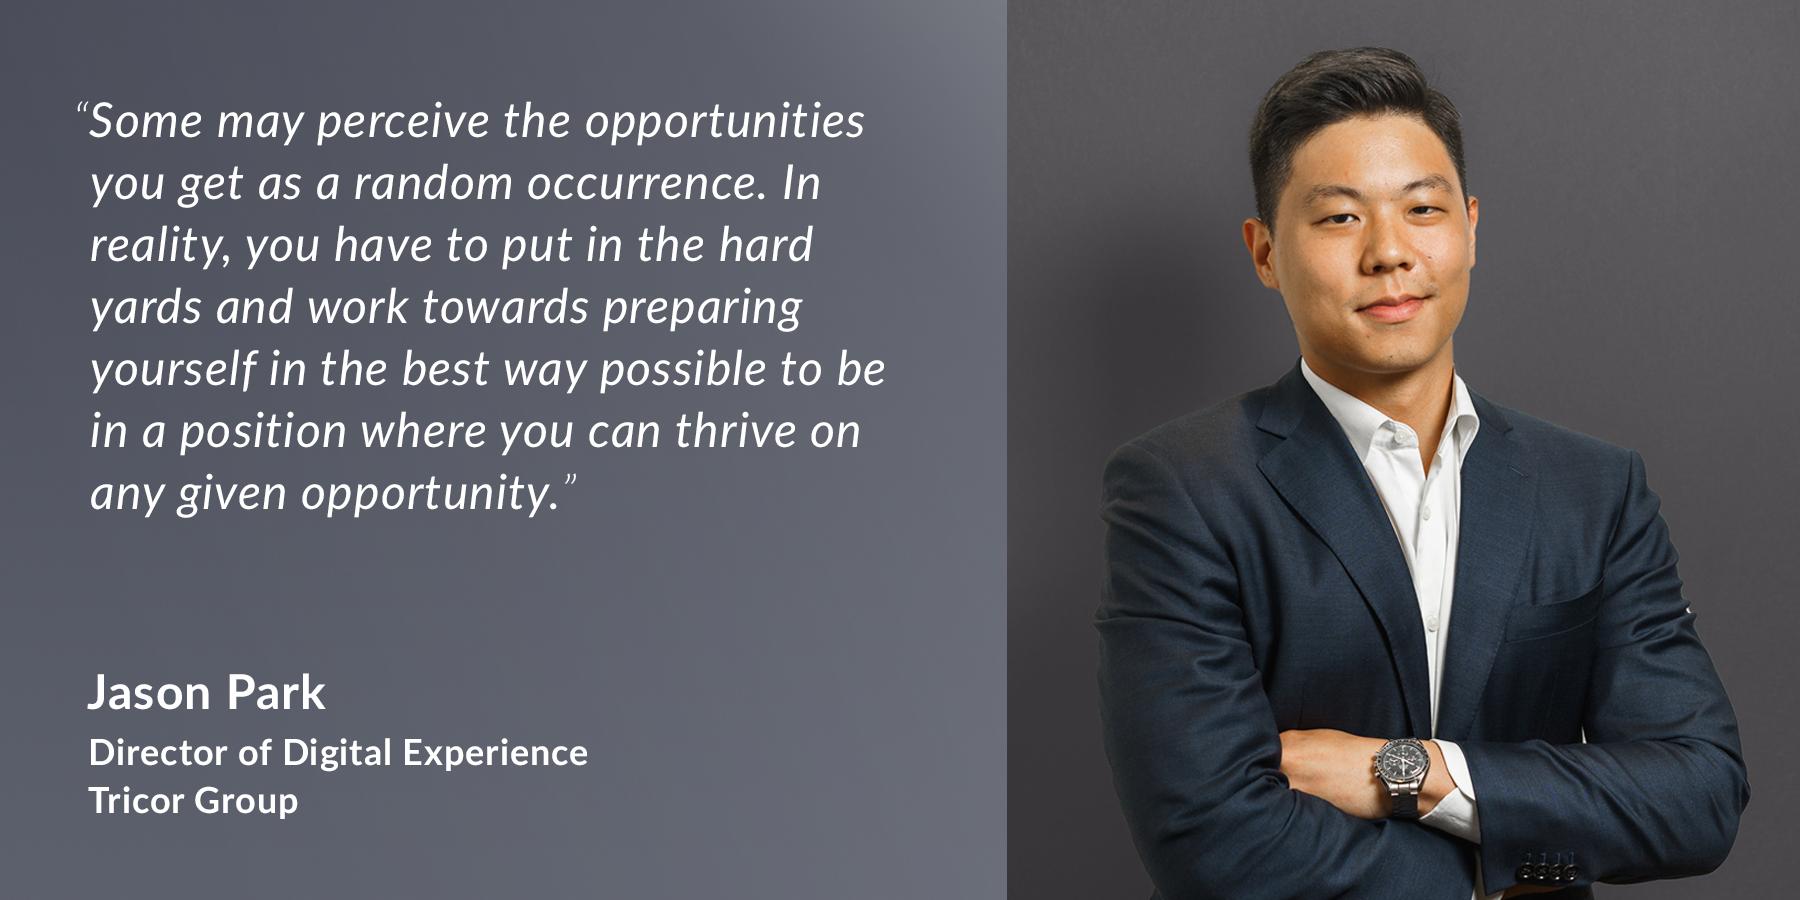 Jason Park - Director of Digital Experience - Tricor Group